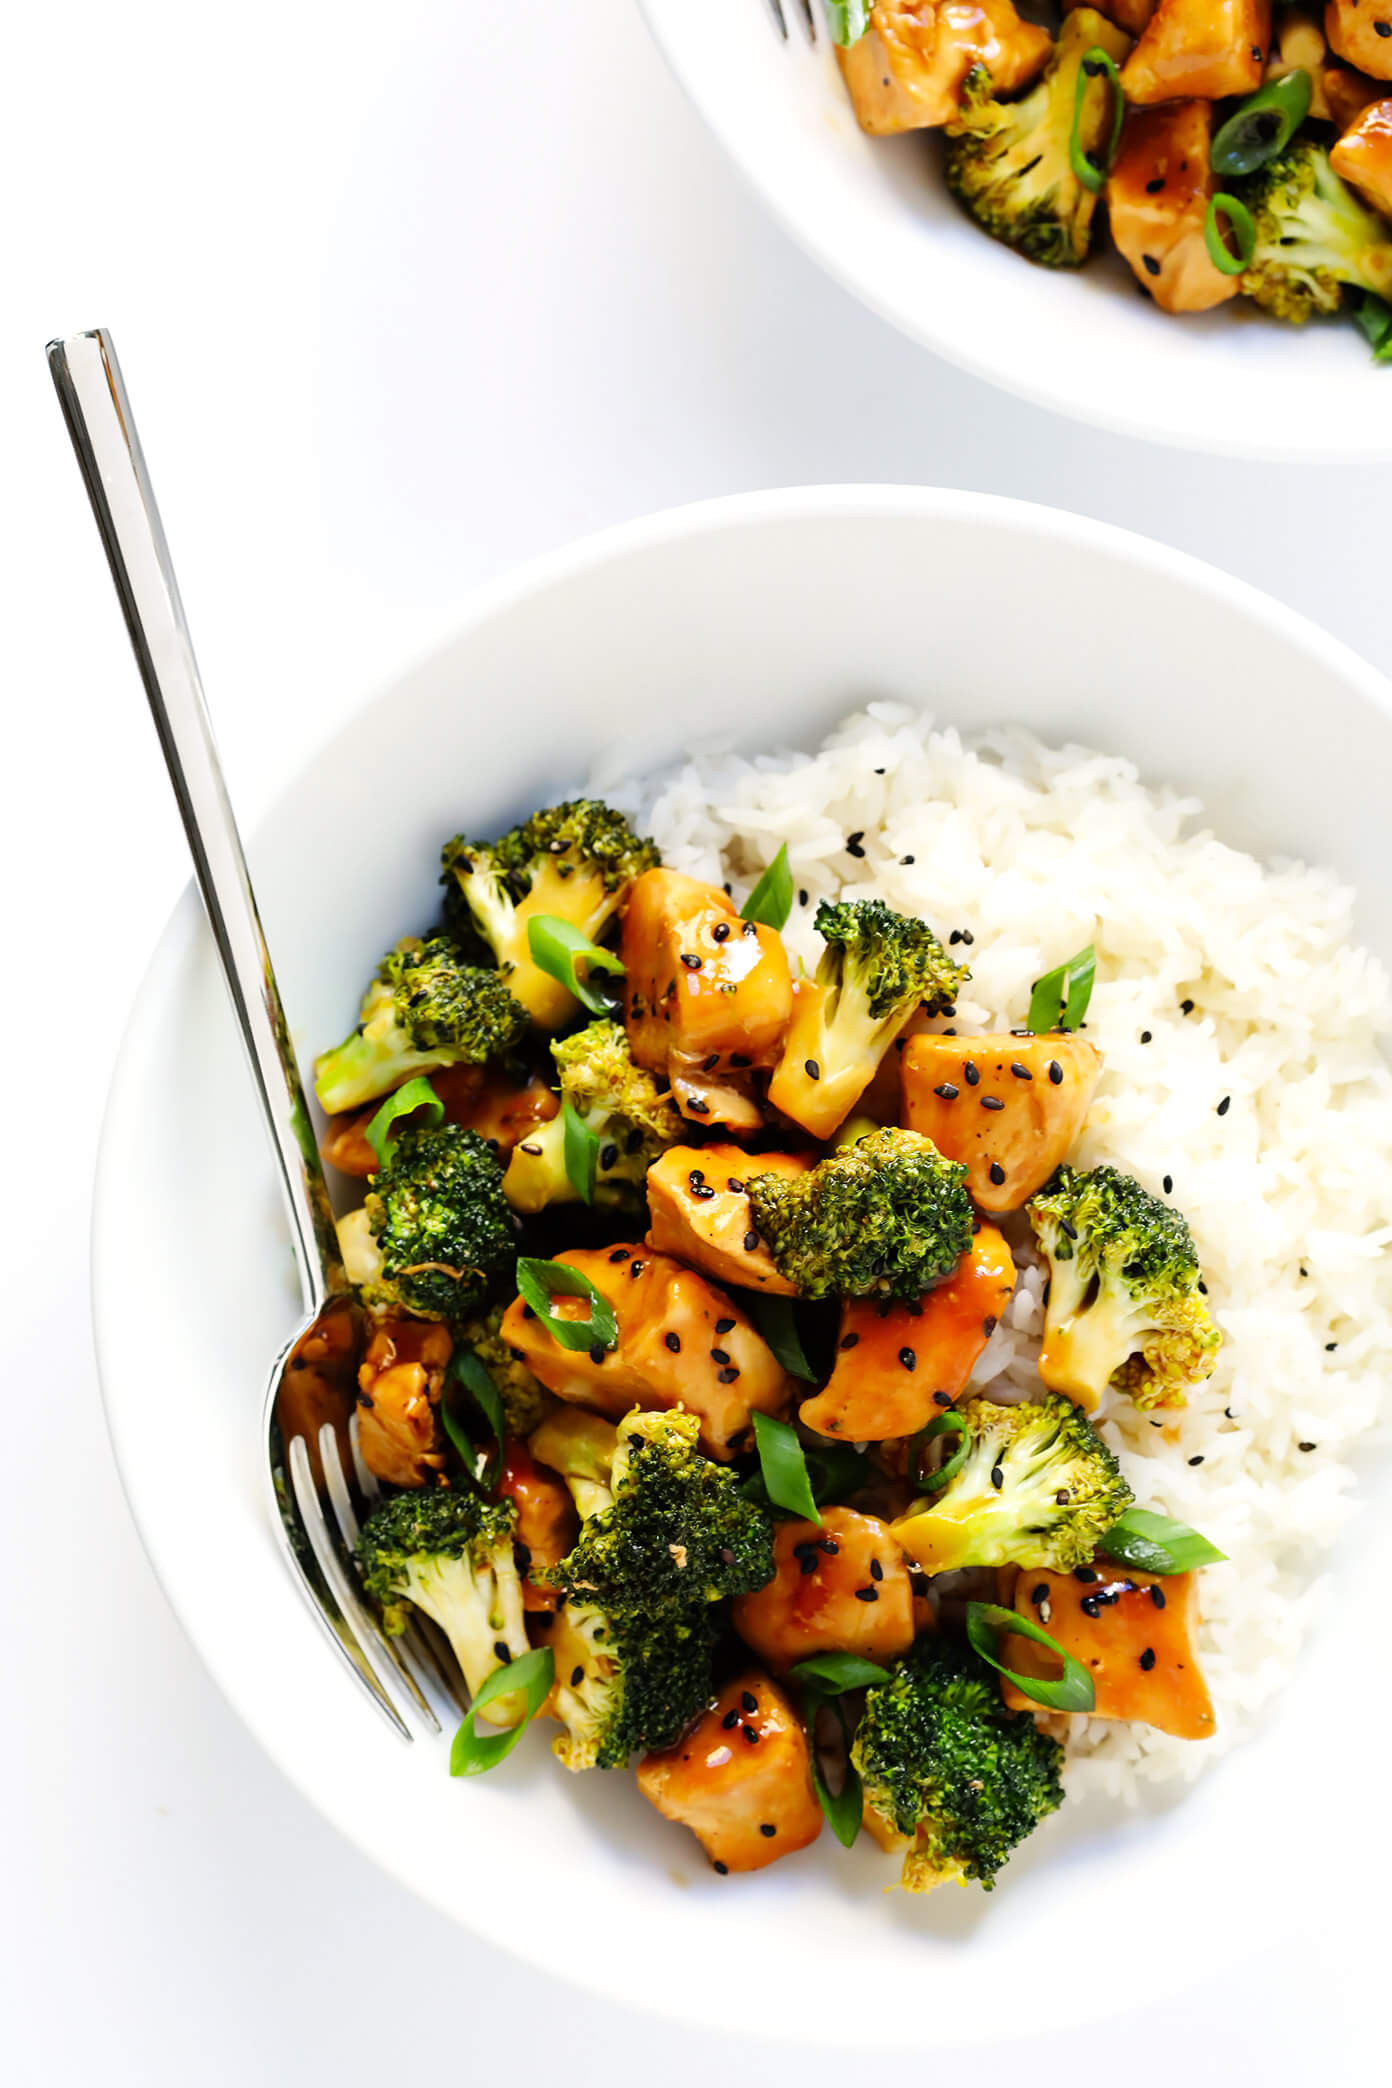 Easy Chicken And Broccoli Recipes  12 Minute Chicken and Broccoli